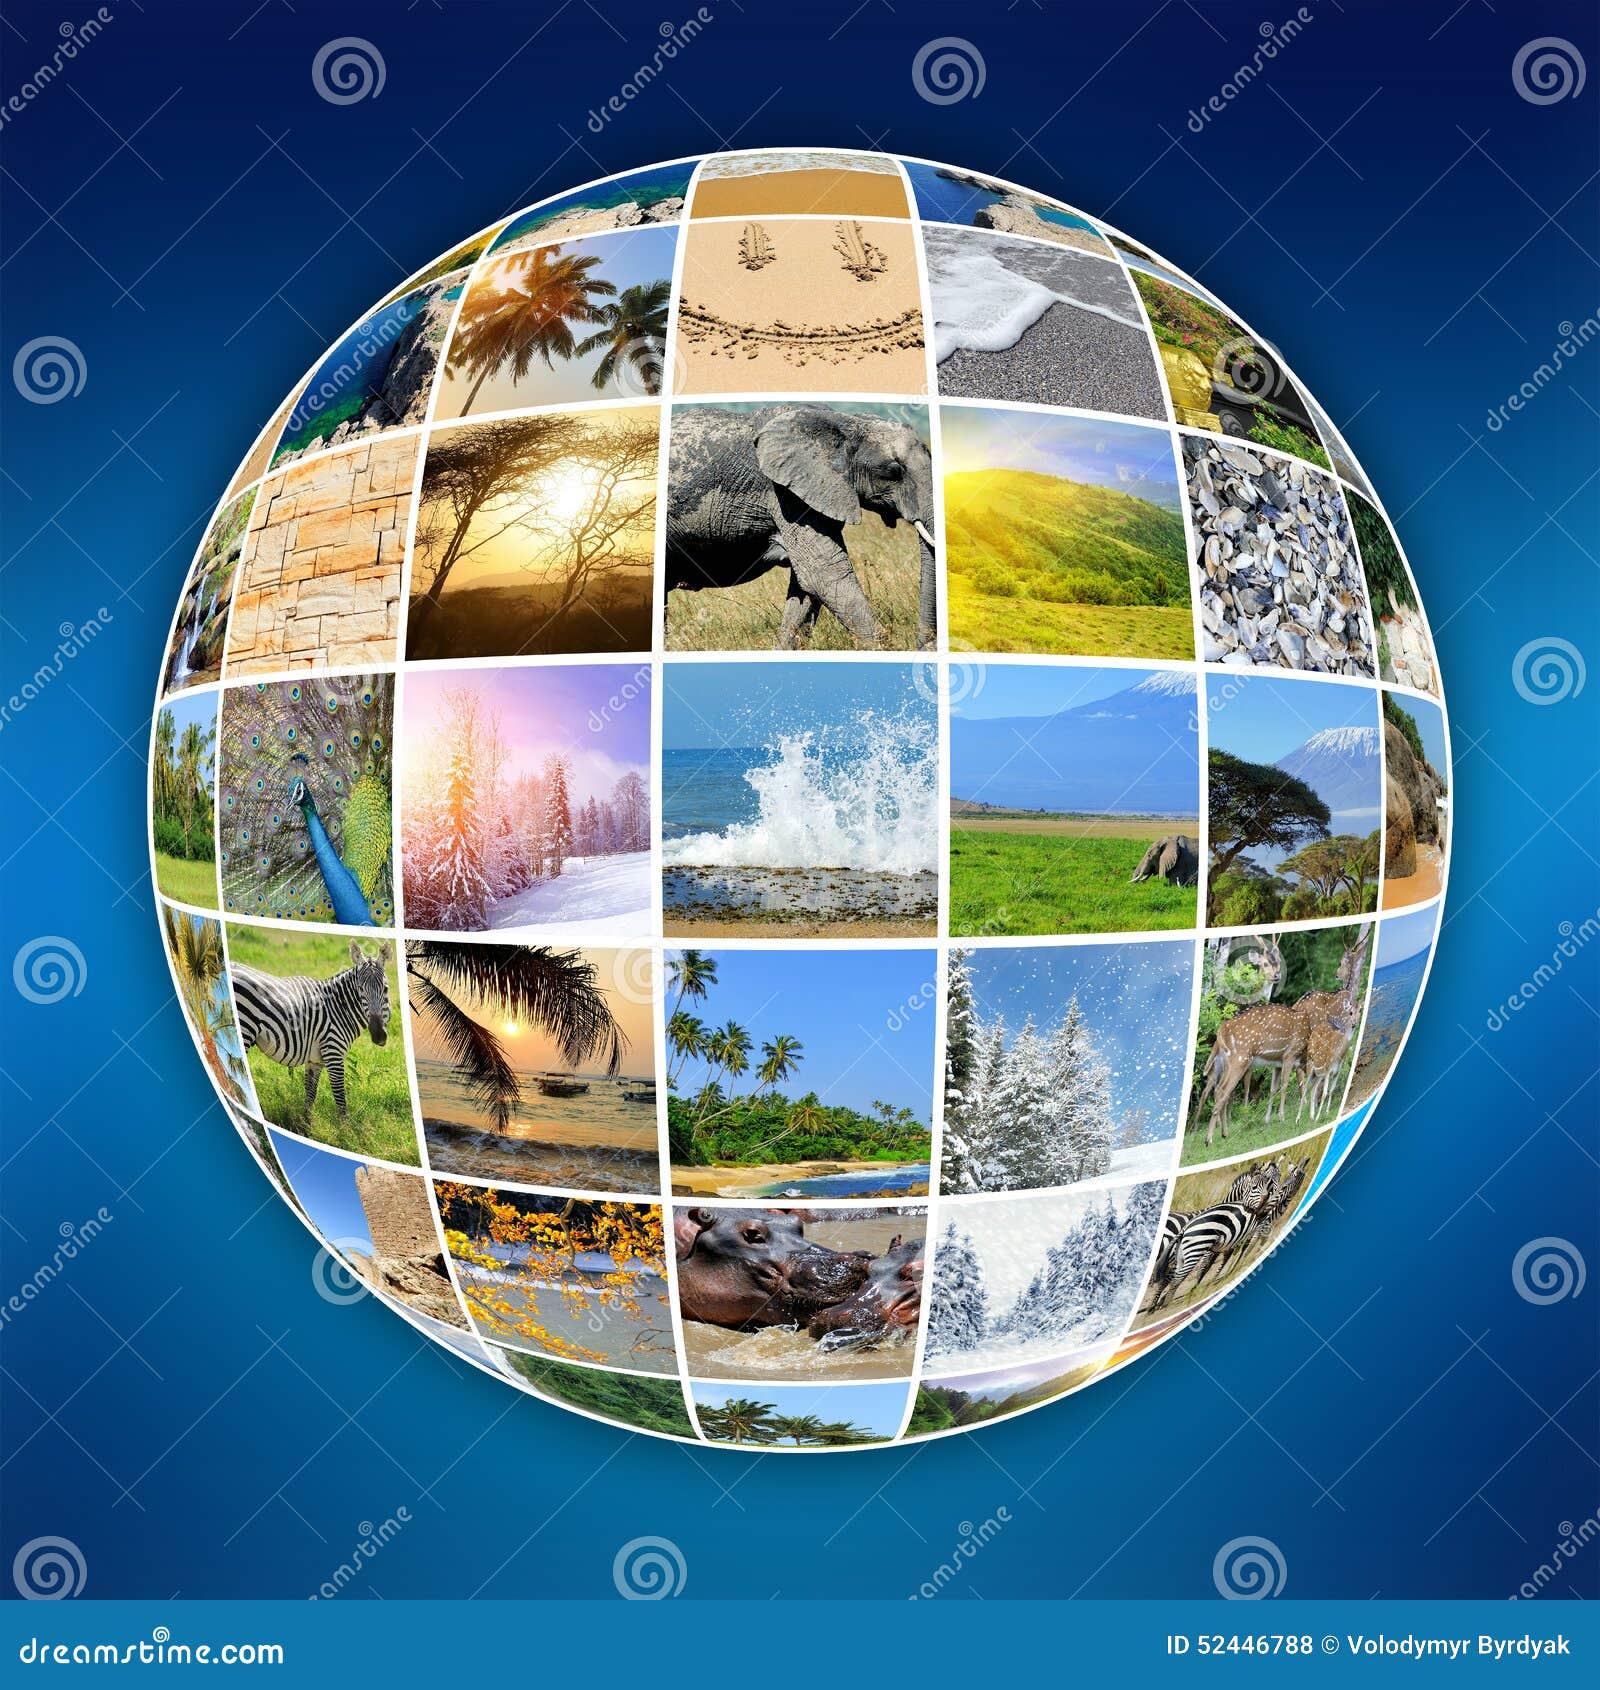 Nature Photo (animal, Landscape, Beach) Stock Photo